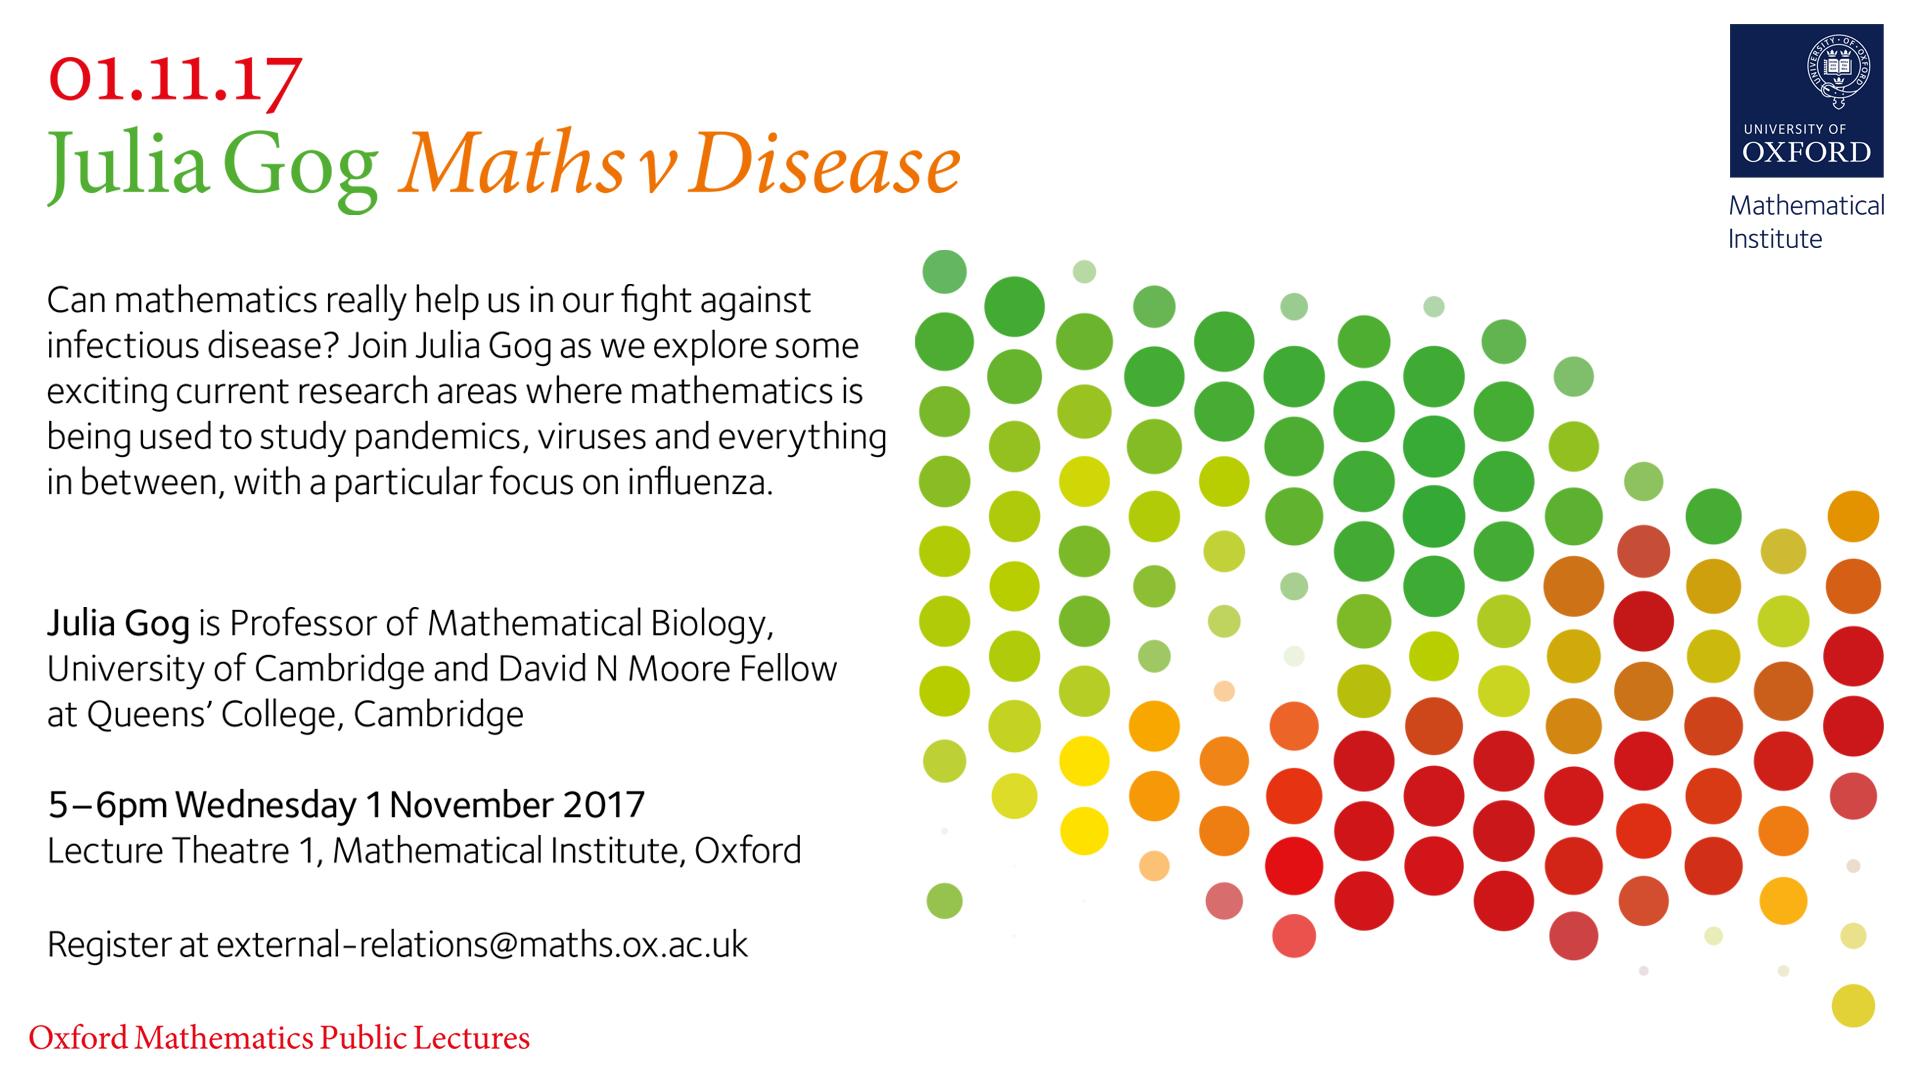 Maths v Disease - Julia Gog on Livestream